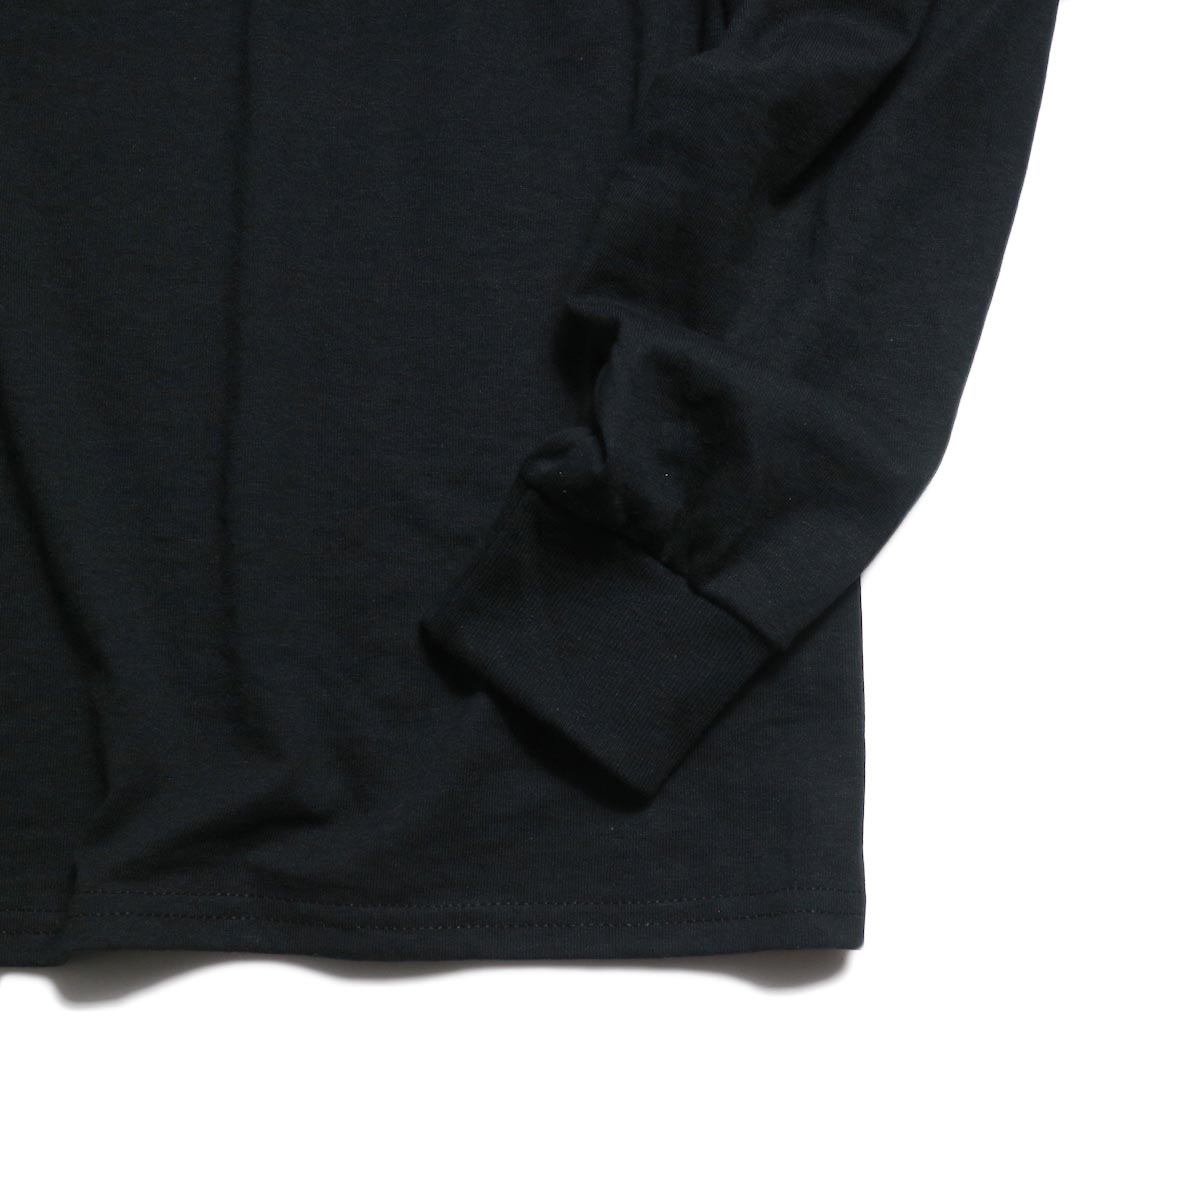 N.HOOLYWOOD × JERZEES  / 191-CS43-070 Long Sleeve Tee -Black 袖、裾